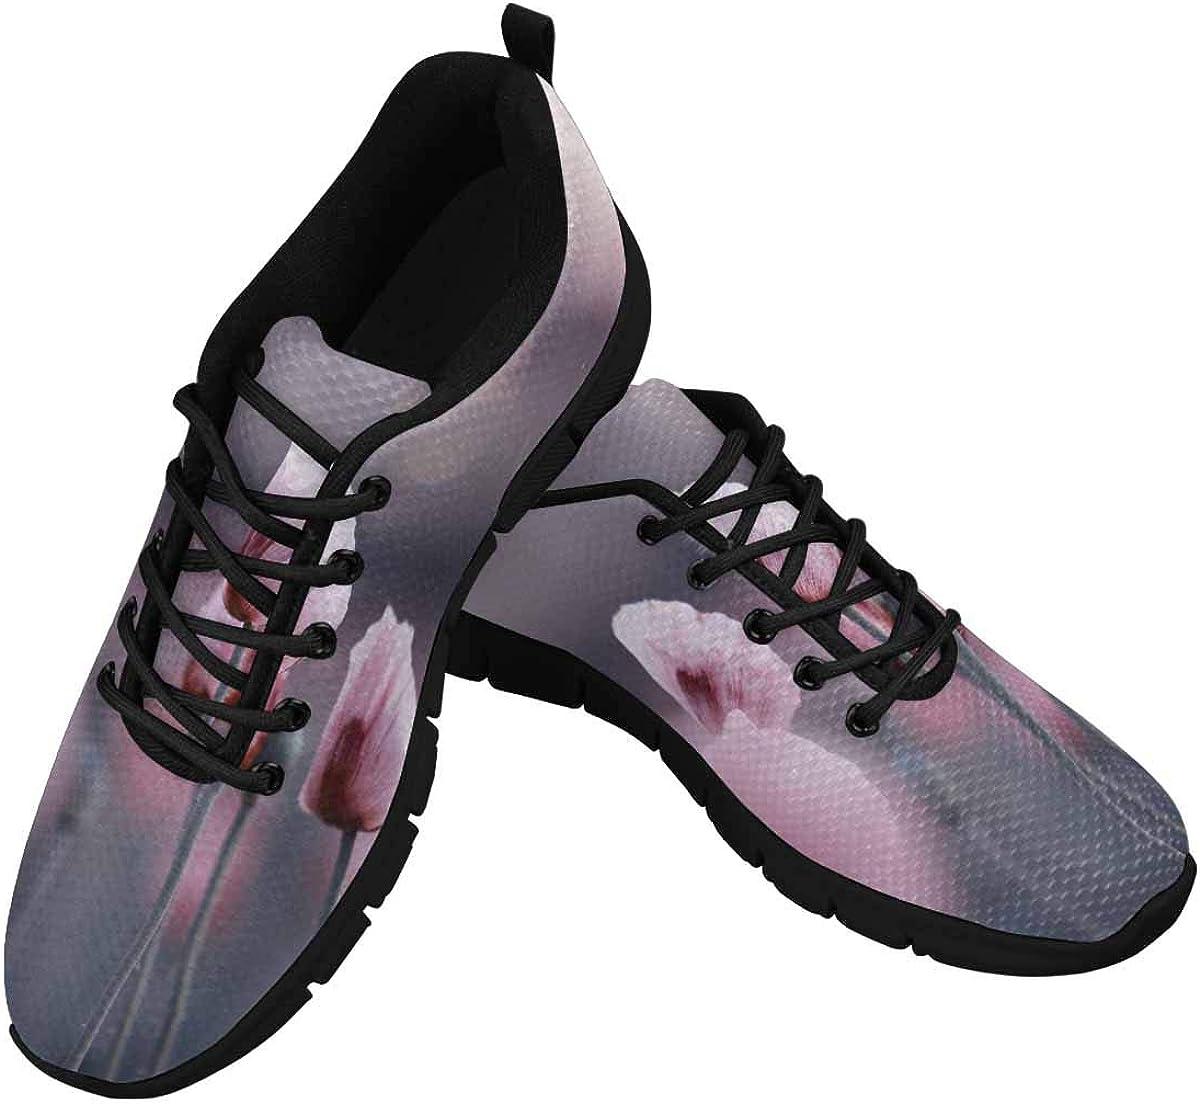 INTERESTPRINT Lilac Poppy Flowers Women Walking Shoes Comfortable Lightweight Work Casual Travel Sneakers